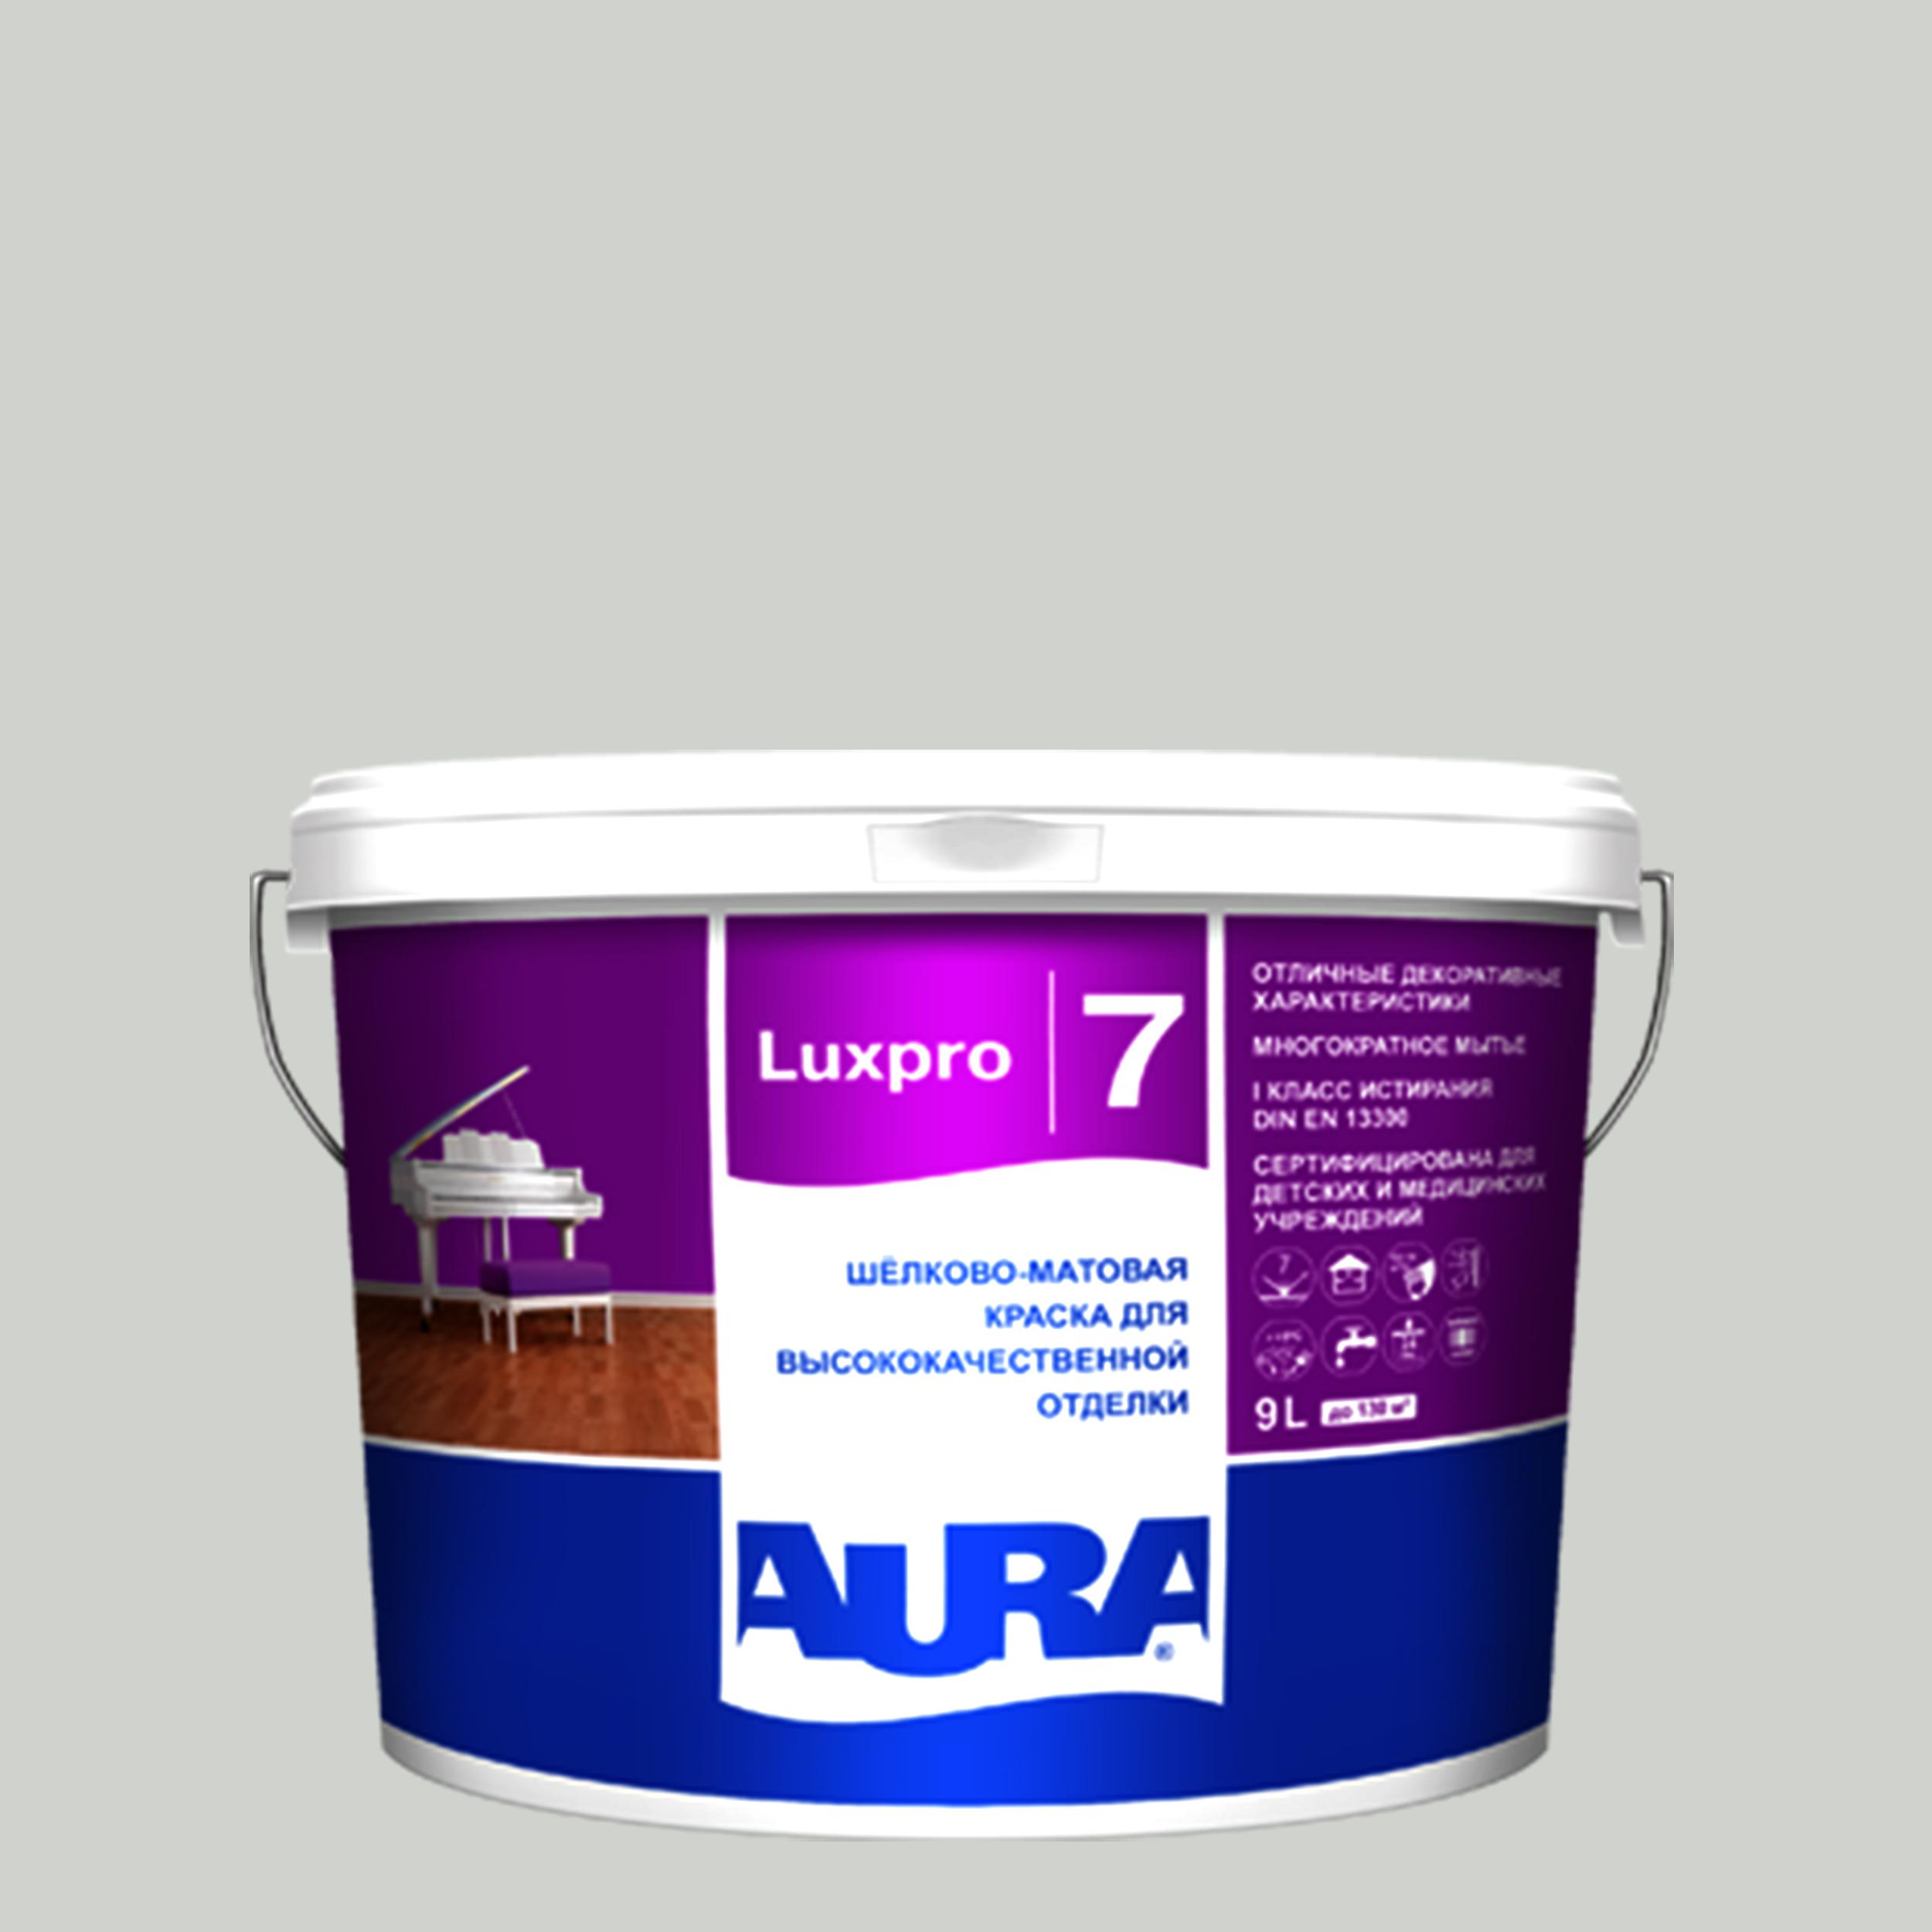 Фото 5 - Краска интерьерная, Aura LuxPRO 7, RAL 5003, 11 кг.